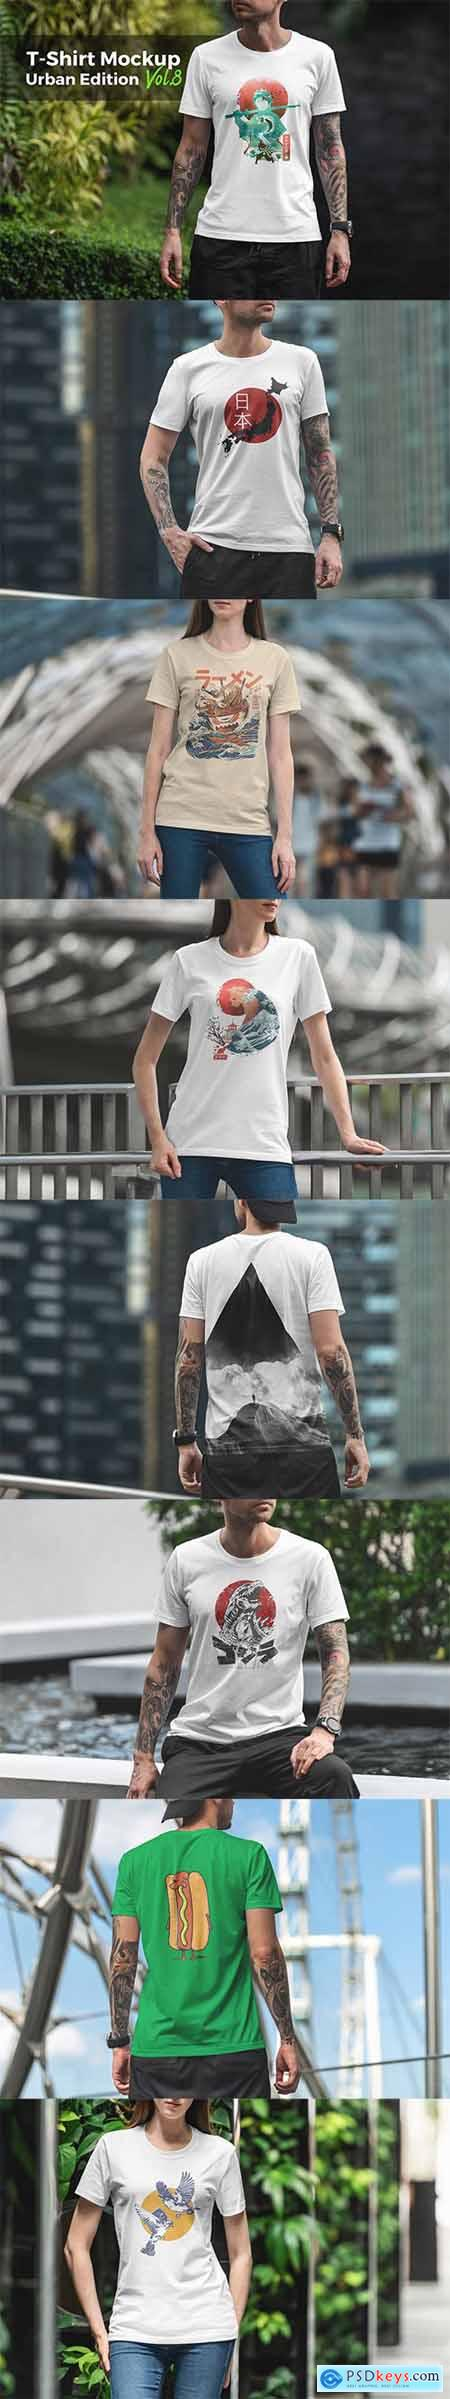 T-Shirt Mockup Urban Edition Vol8